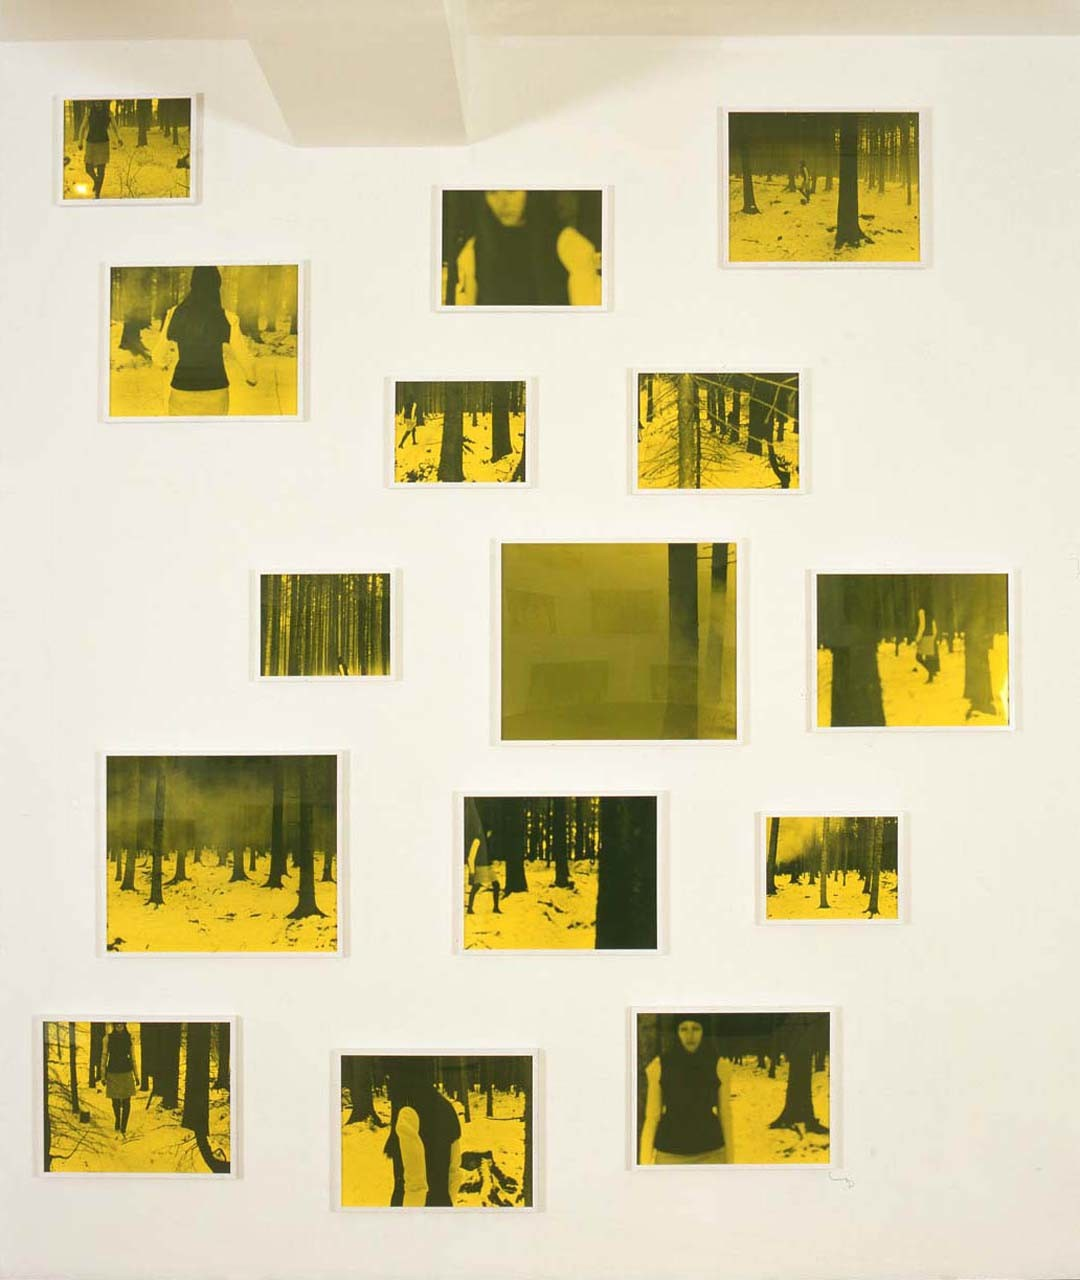 "<div class=""artwork_caption""><p>Siebteroktoberneunzehnhundertneunundneunzig, 1999</p></div>"